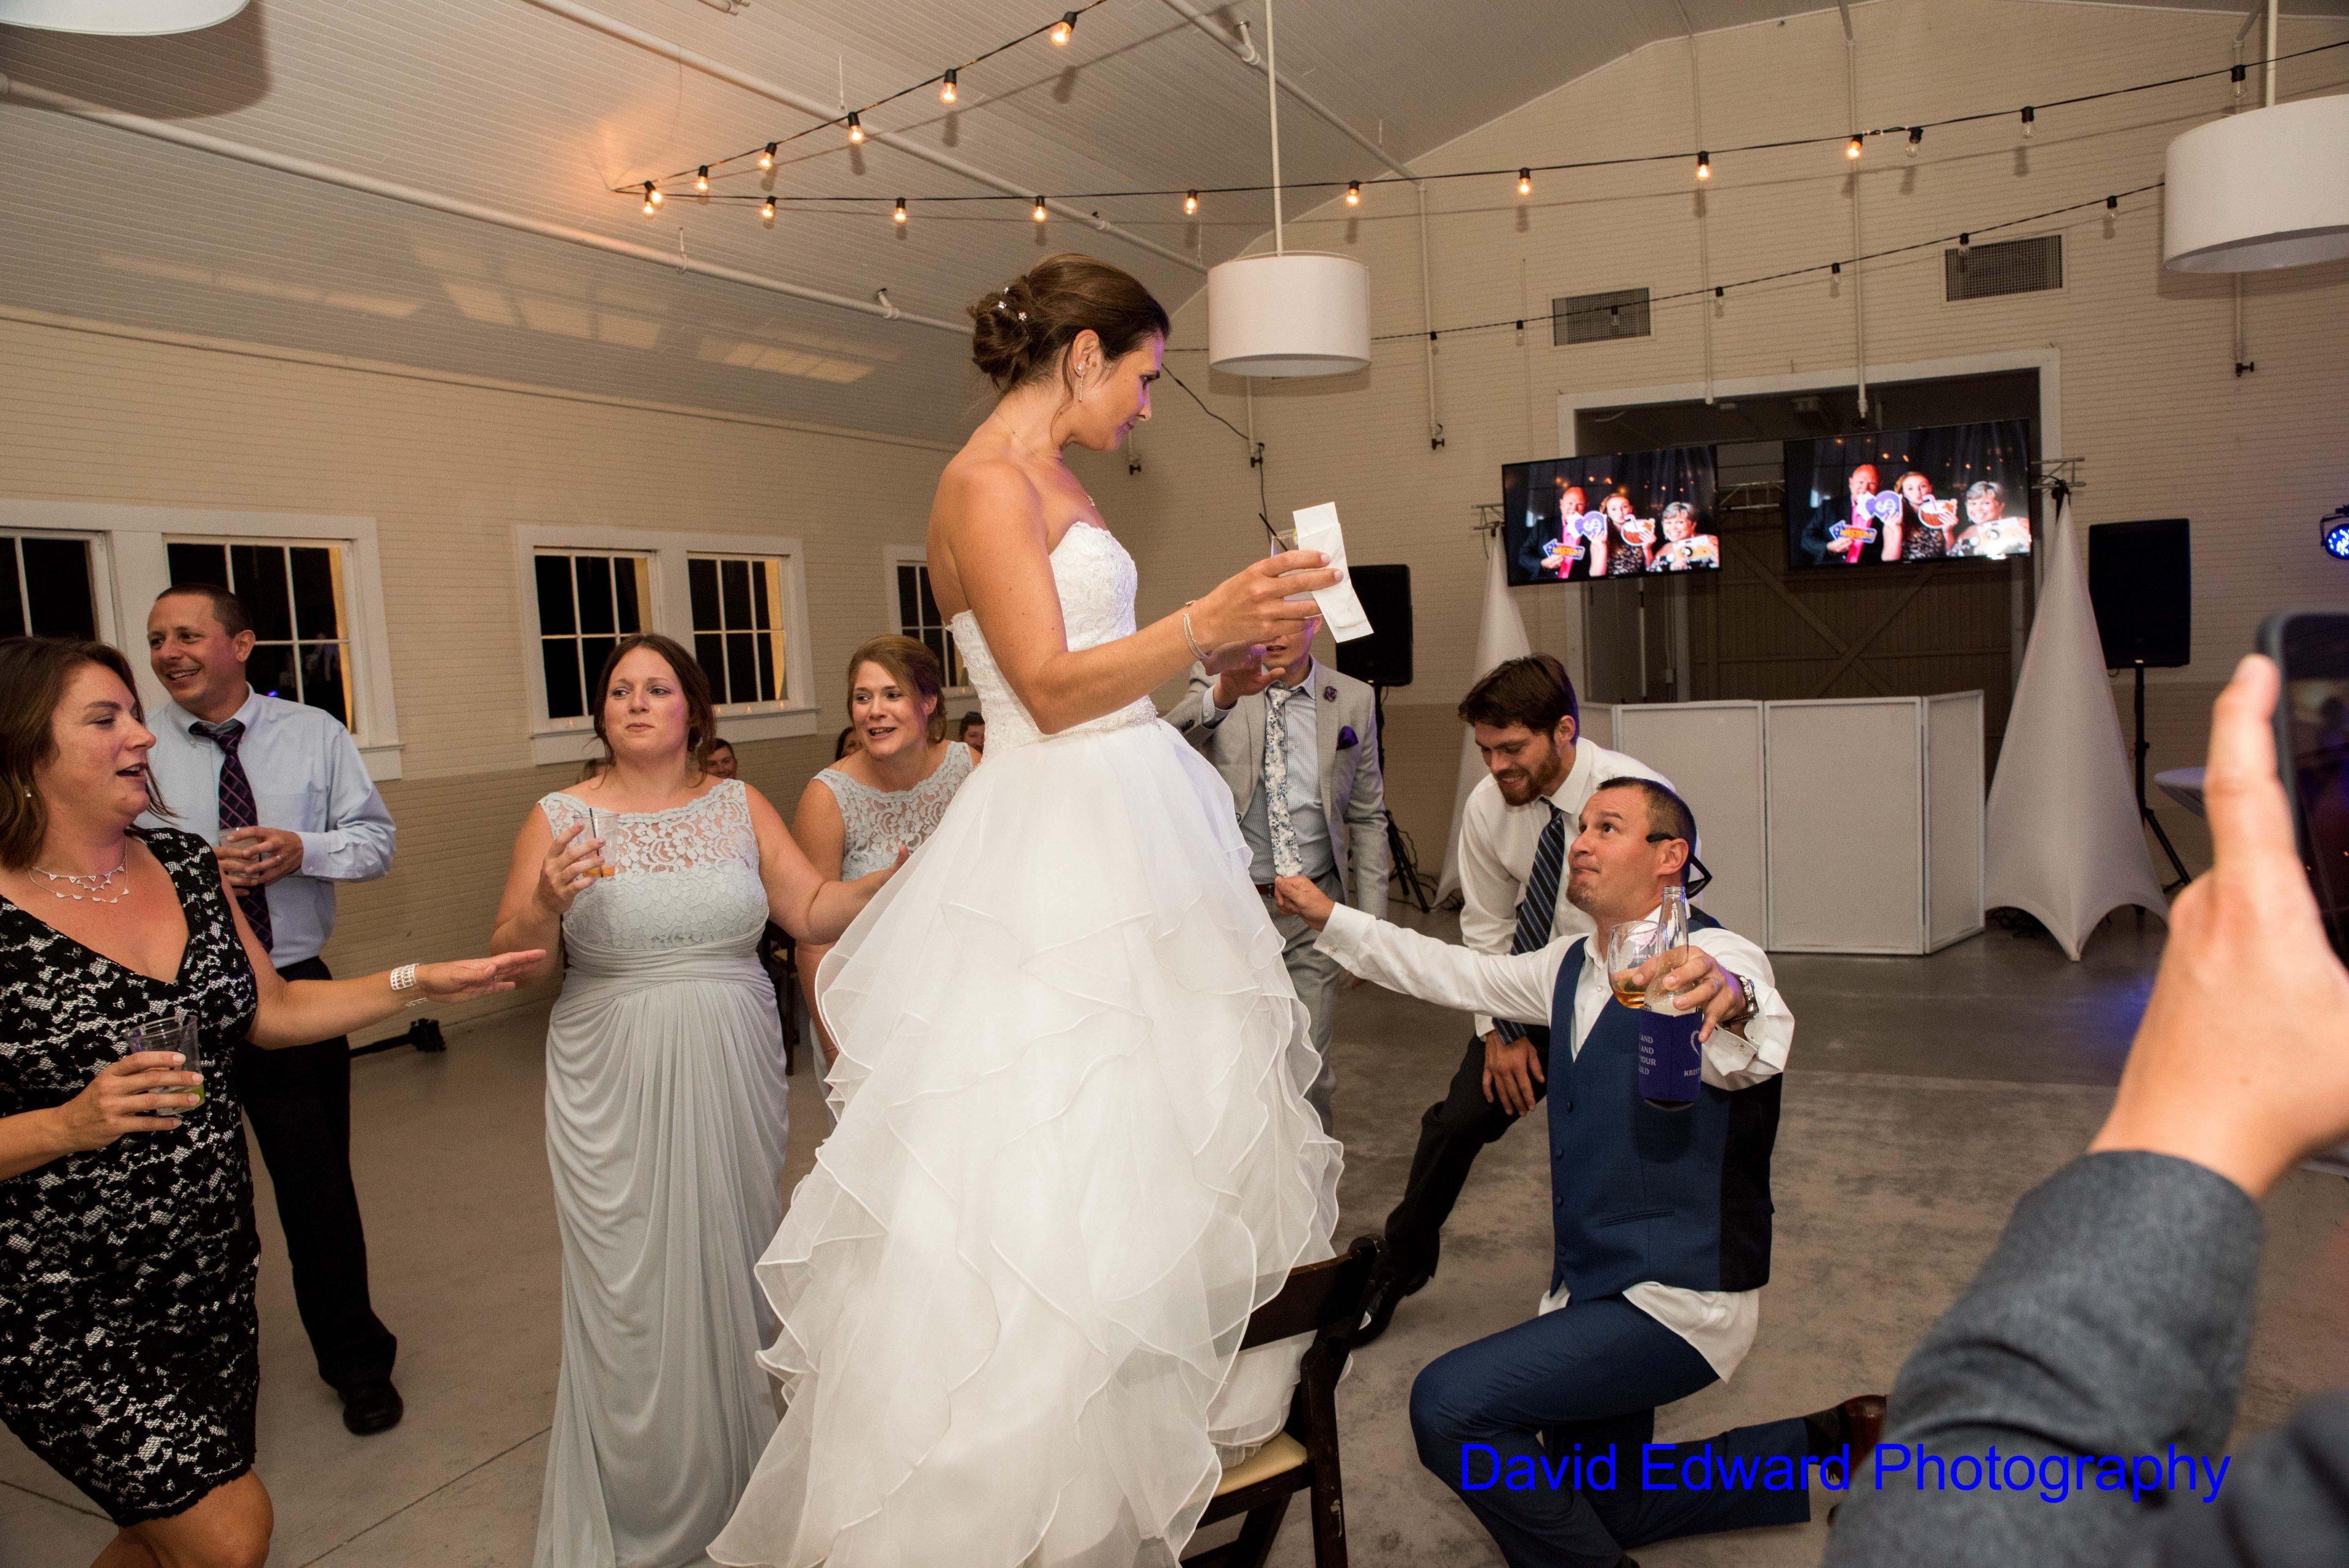 Magnificent Moments Weddings Dairy Barn David Edward Photography(22) Min